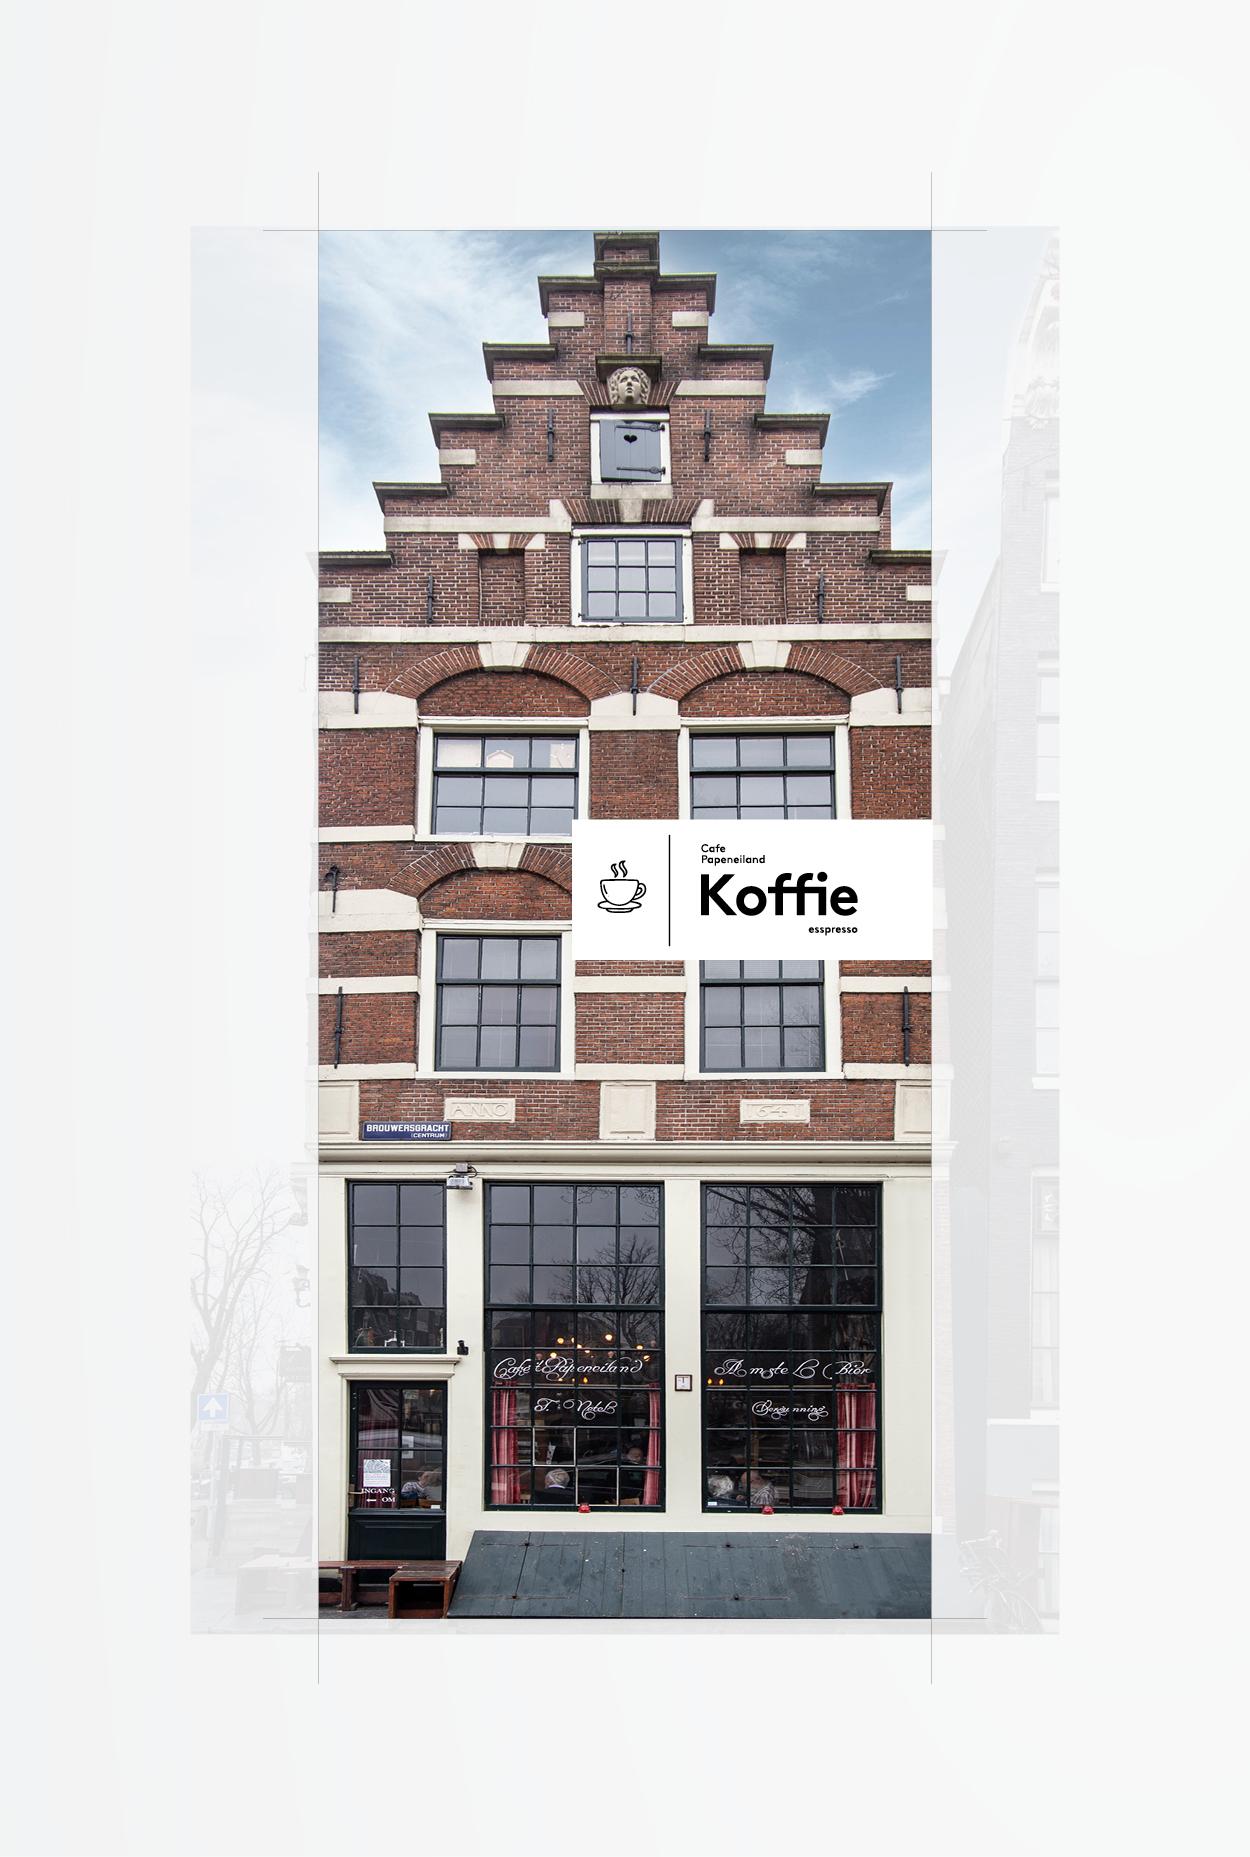 Studio Zakmes Papeneiland Koffie Packaging